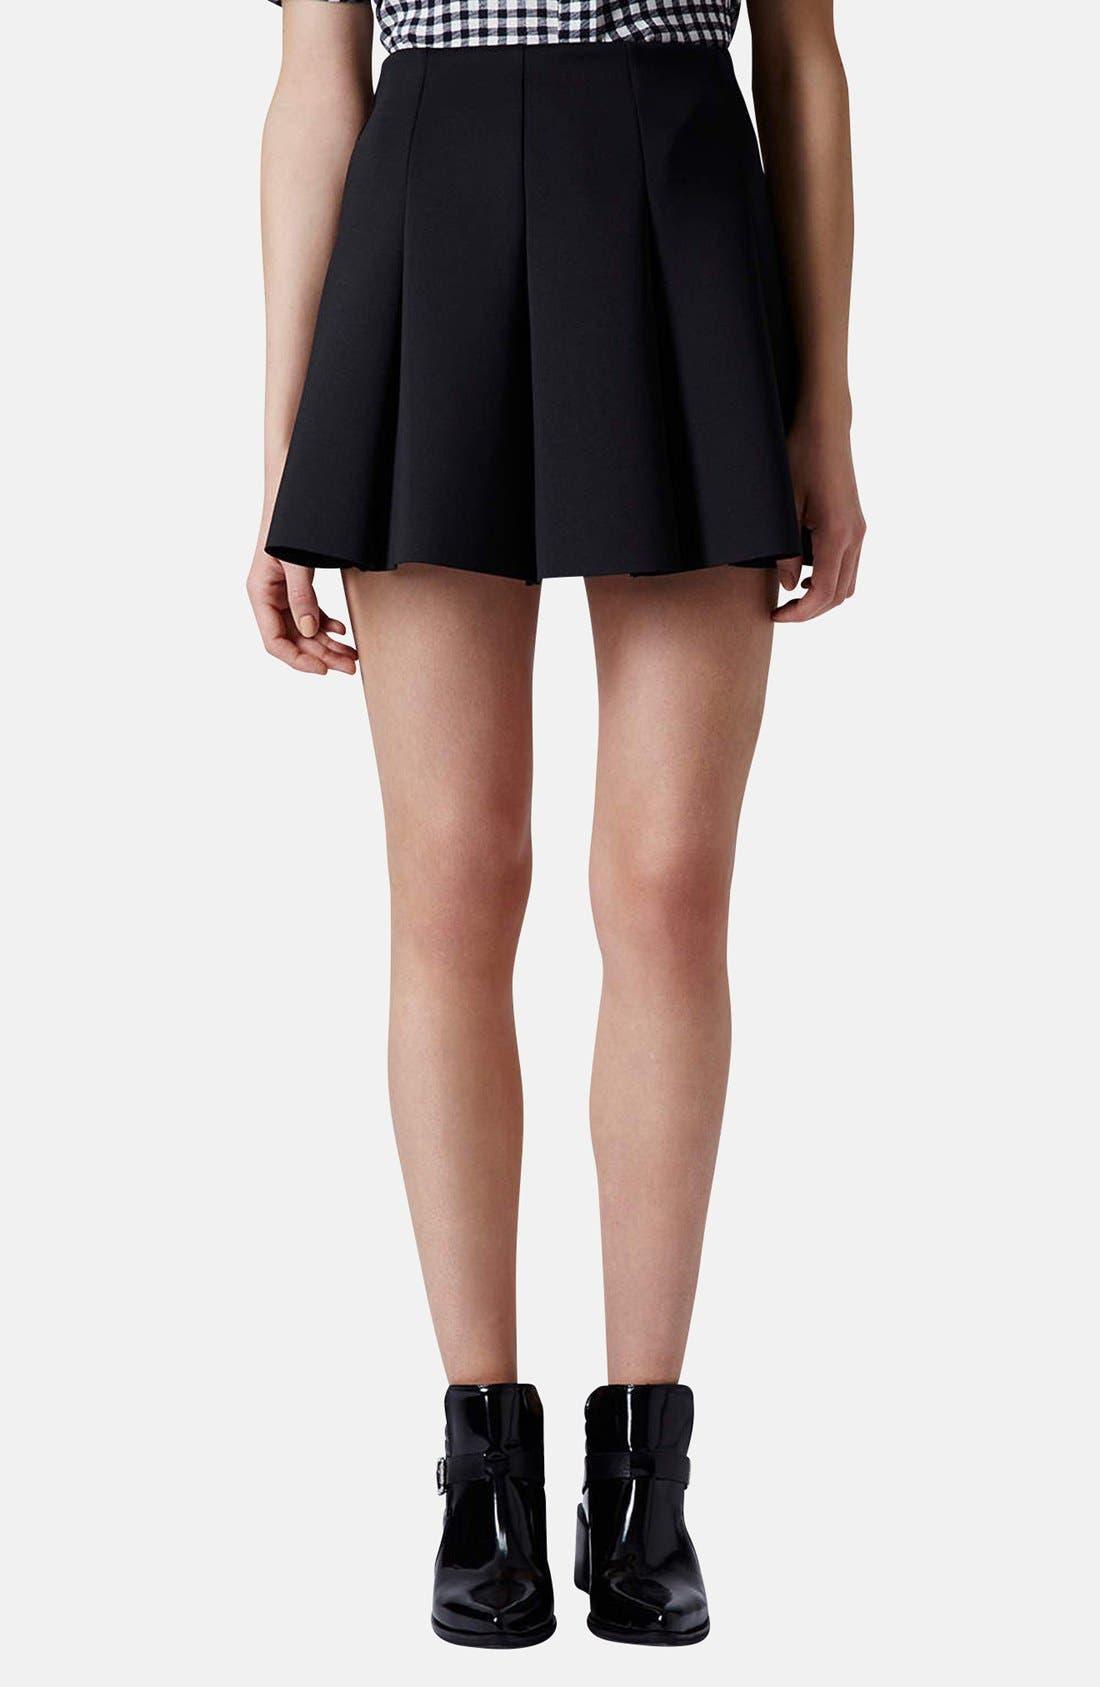 Alternate Image 1 Selected - Topshop Pleat Scuba Skirt (Petite)